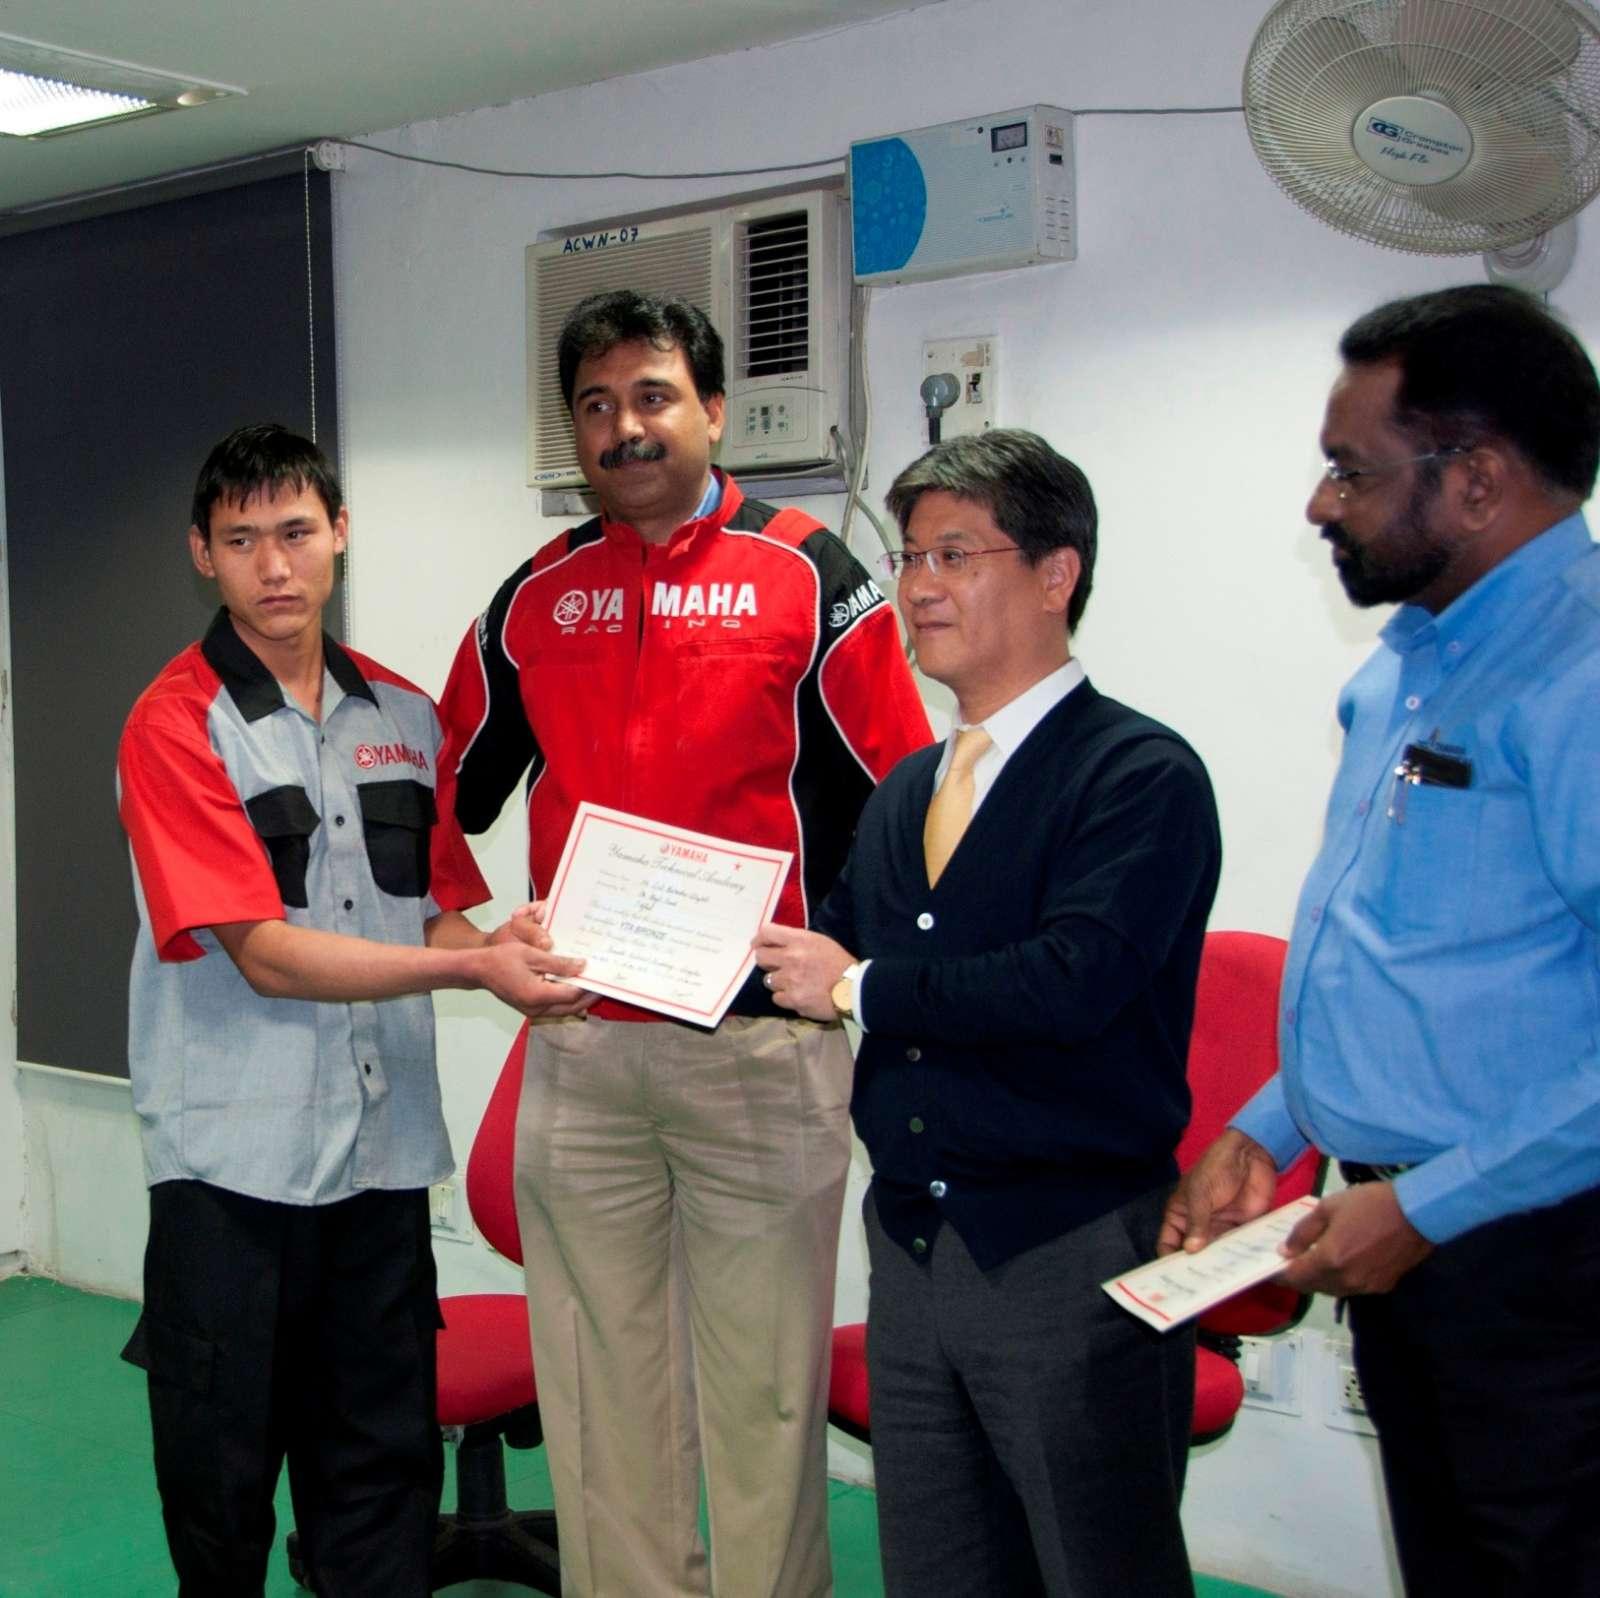 Mr. Hiroyuki Suzuki-MD,India Yamaha Motor and Mr.Ravinder Singh, Group Head - Service Marketing, India Yamaha Motor felicitating the students-2